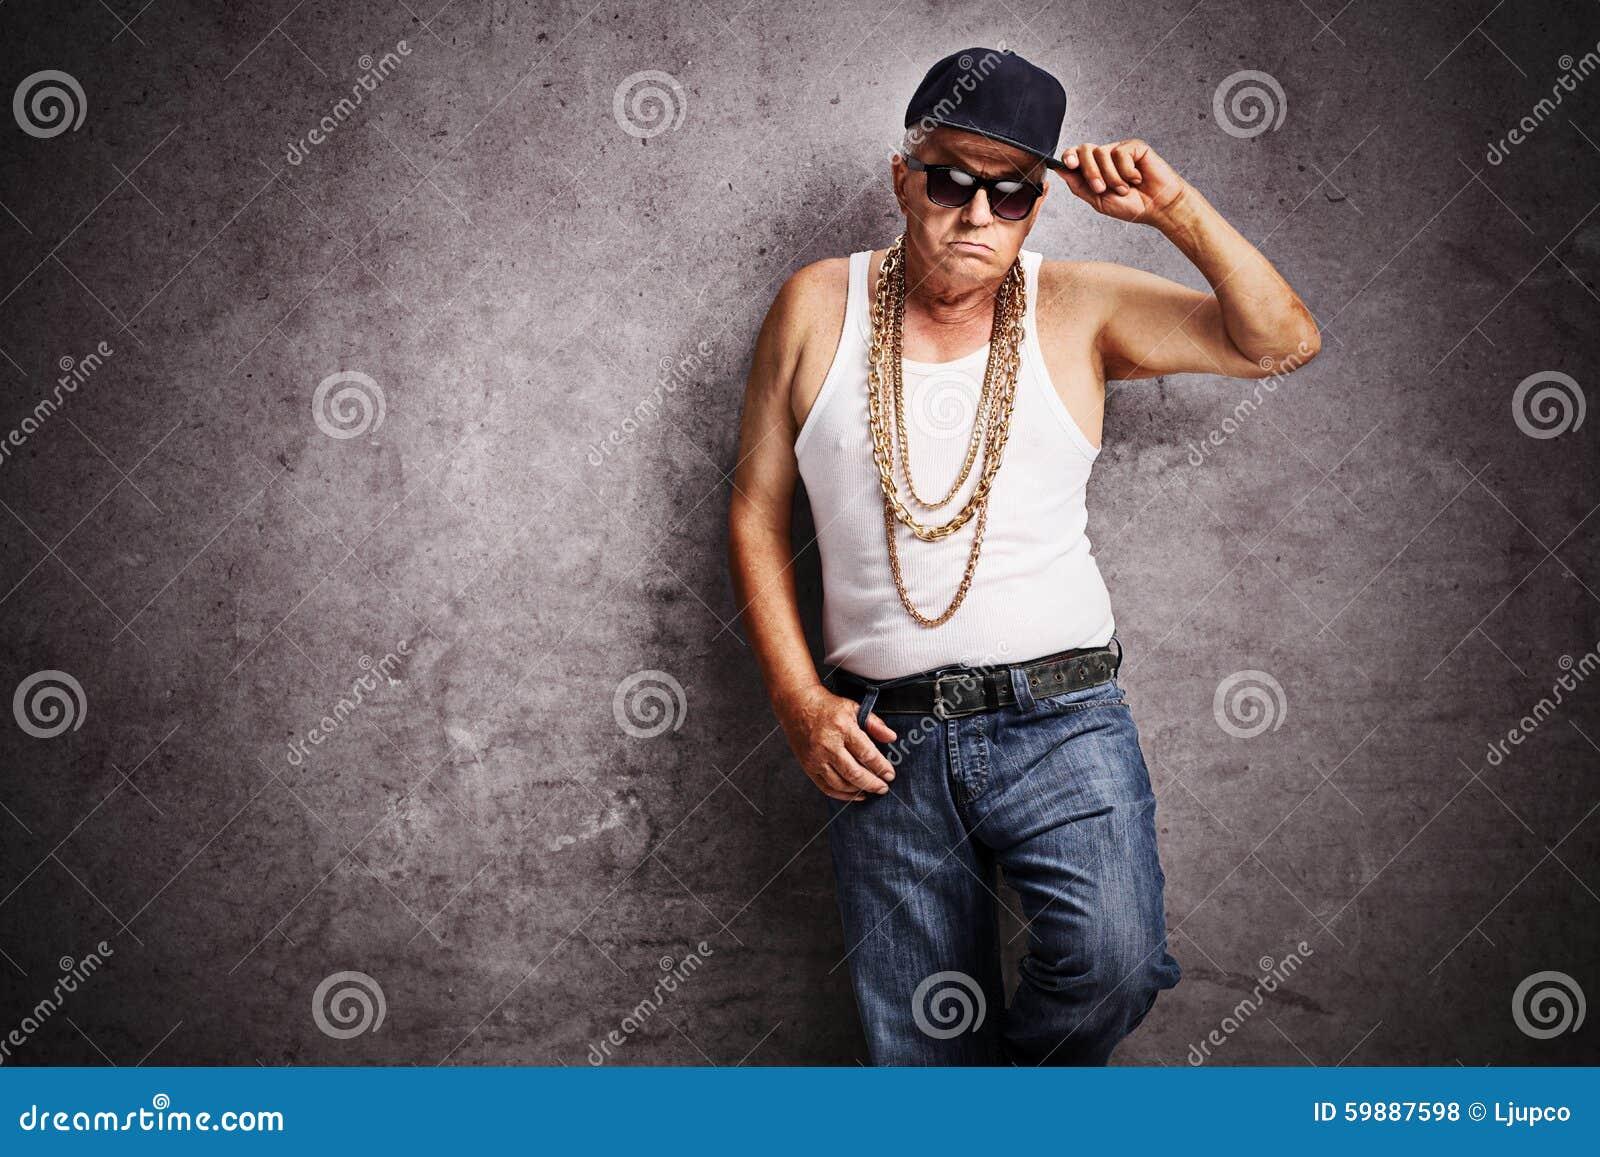 Hogere gangster in flodderige hiphopkleren